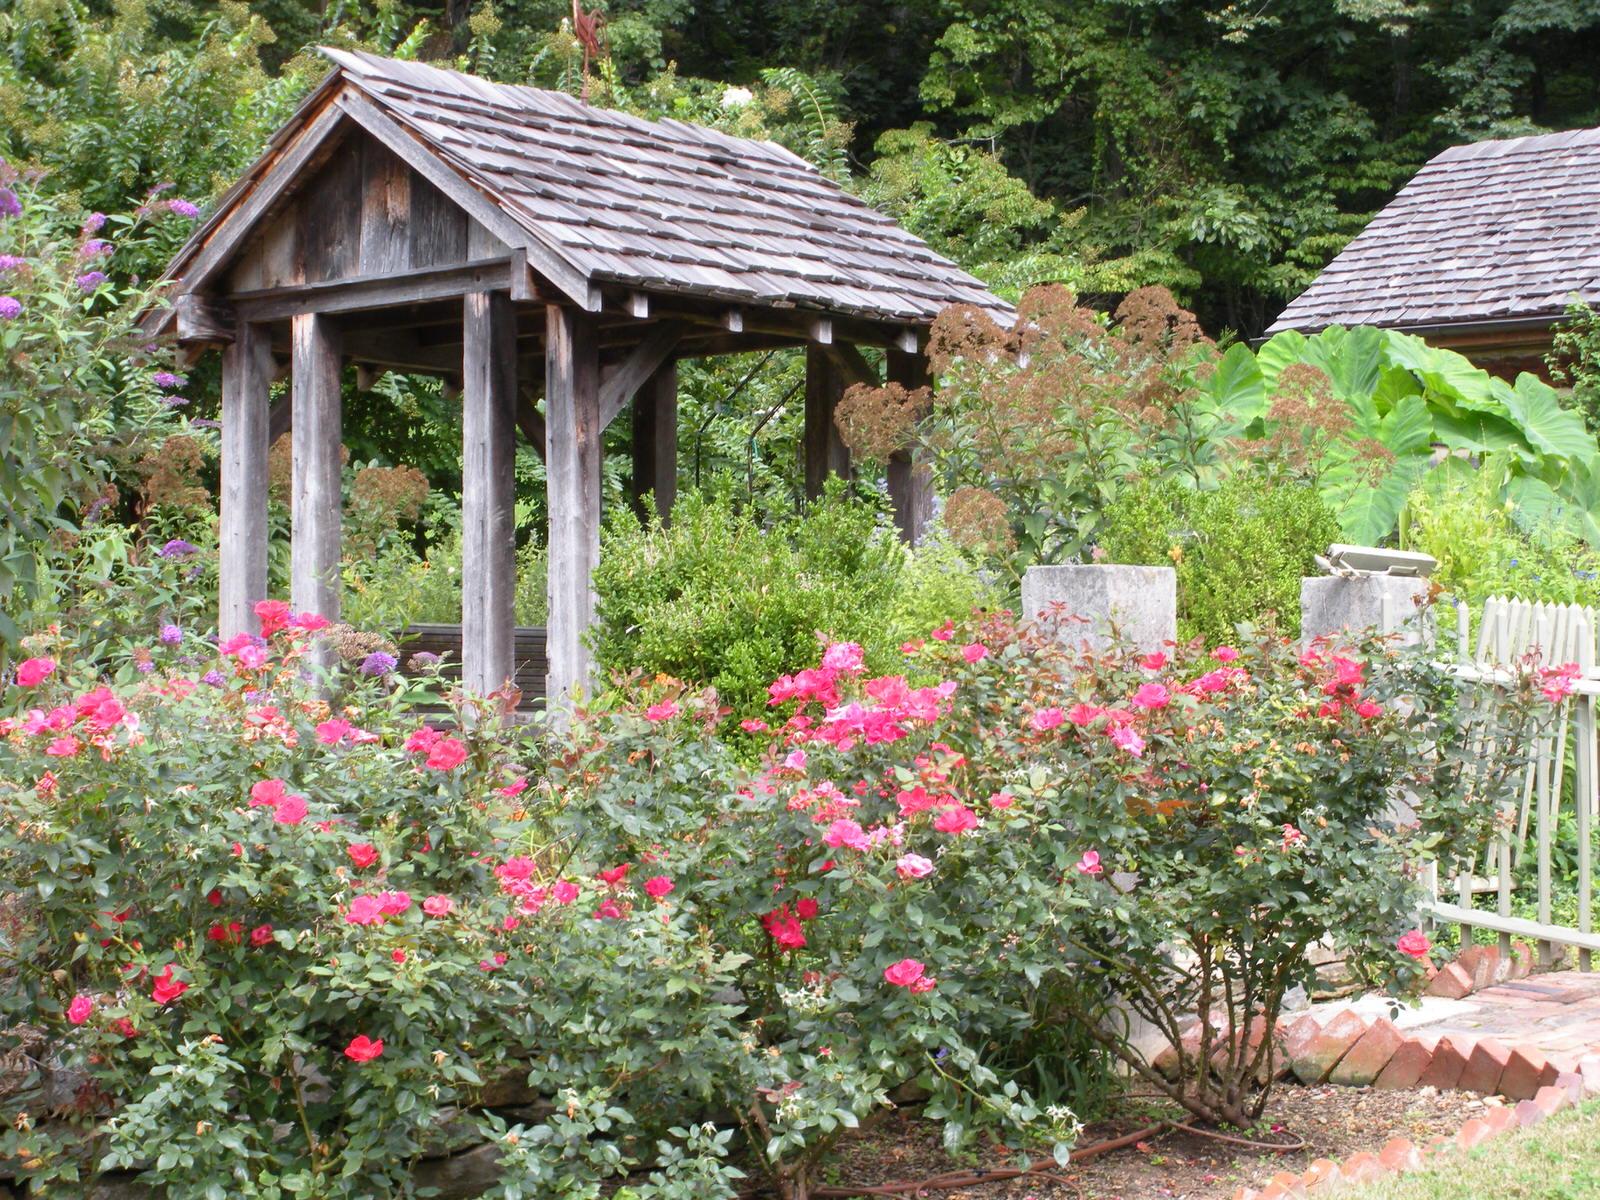 Justin Stelter Landscape Gardening - Country Garden - Justin Stelter Landscape Gardening - Country Garden2887090454_5a0d6b63cd_o.jpg